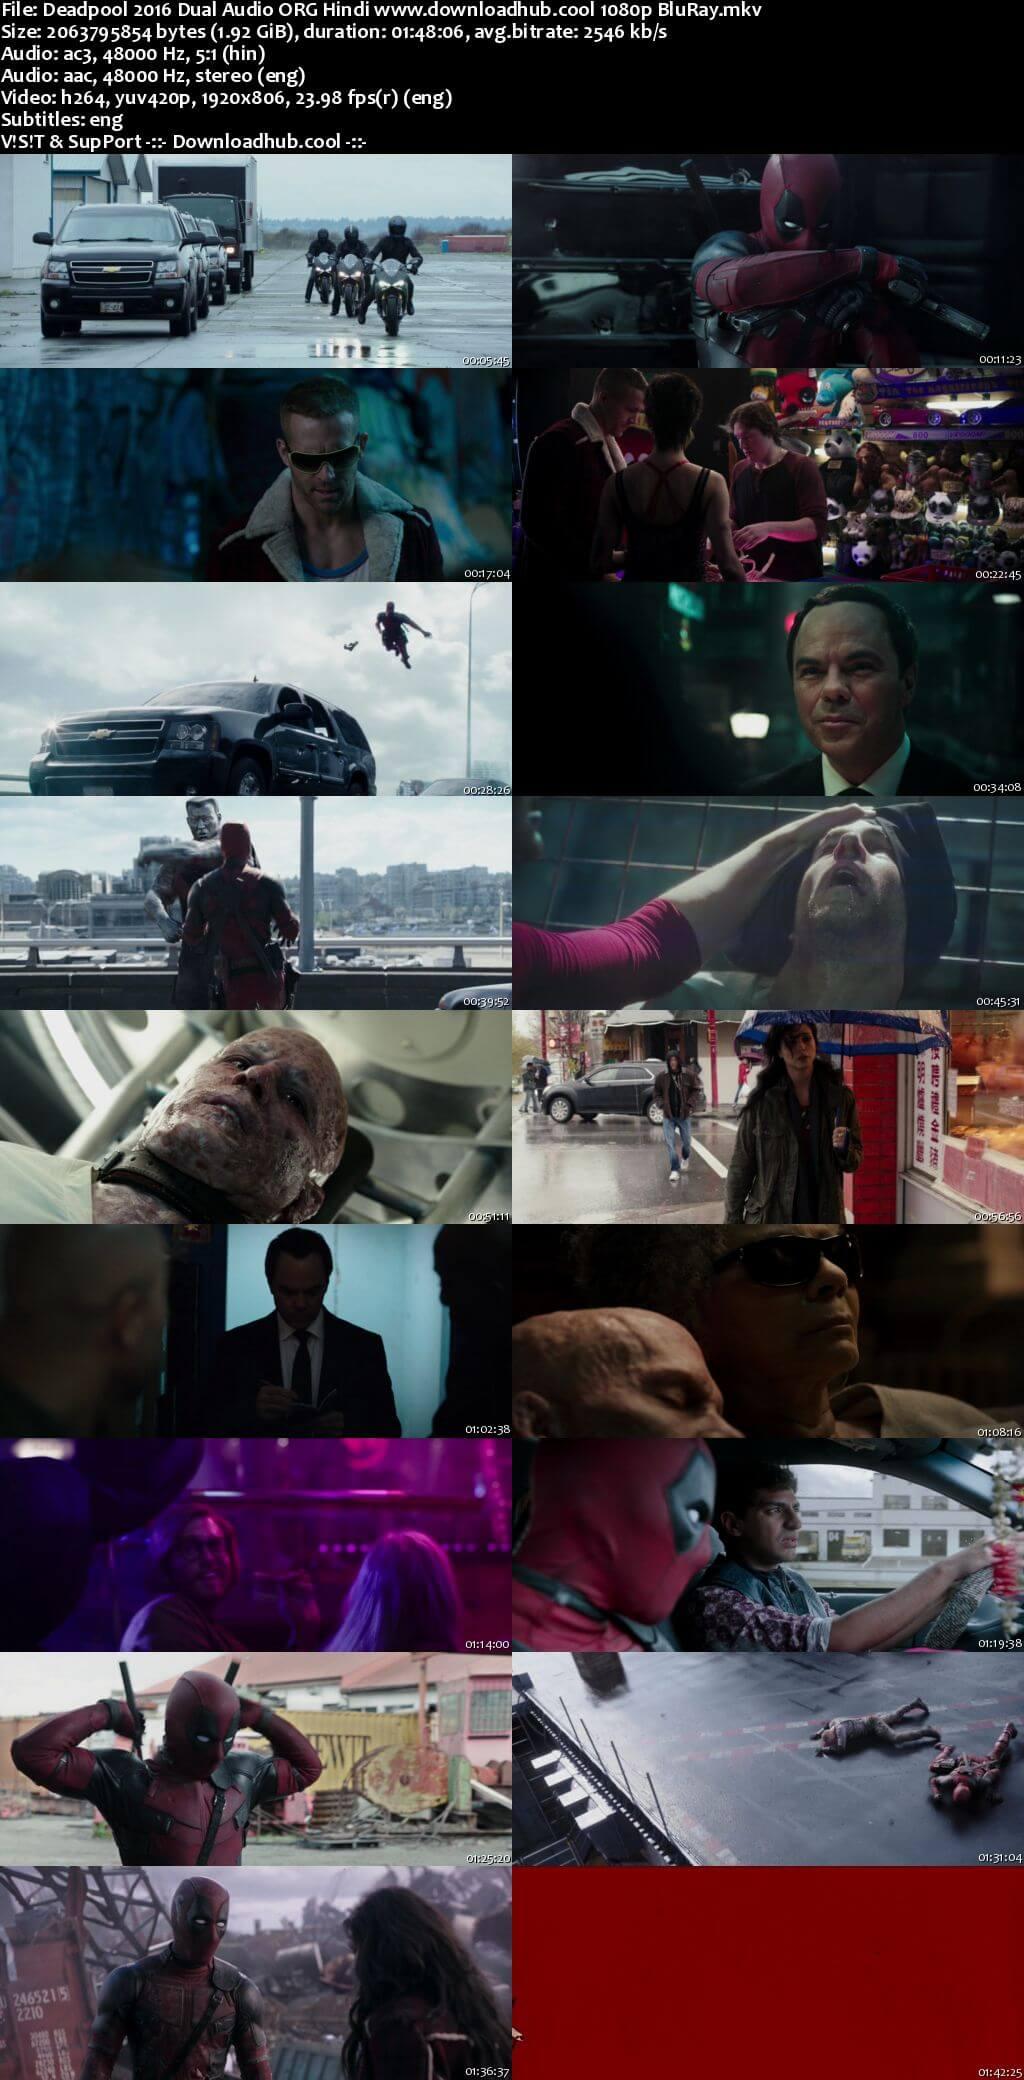 Deadpool 2016 Hindi ORG Dual Audio 1080p BluRay ESubs